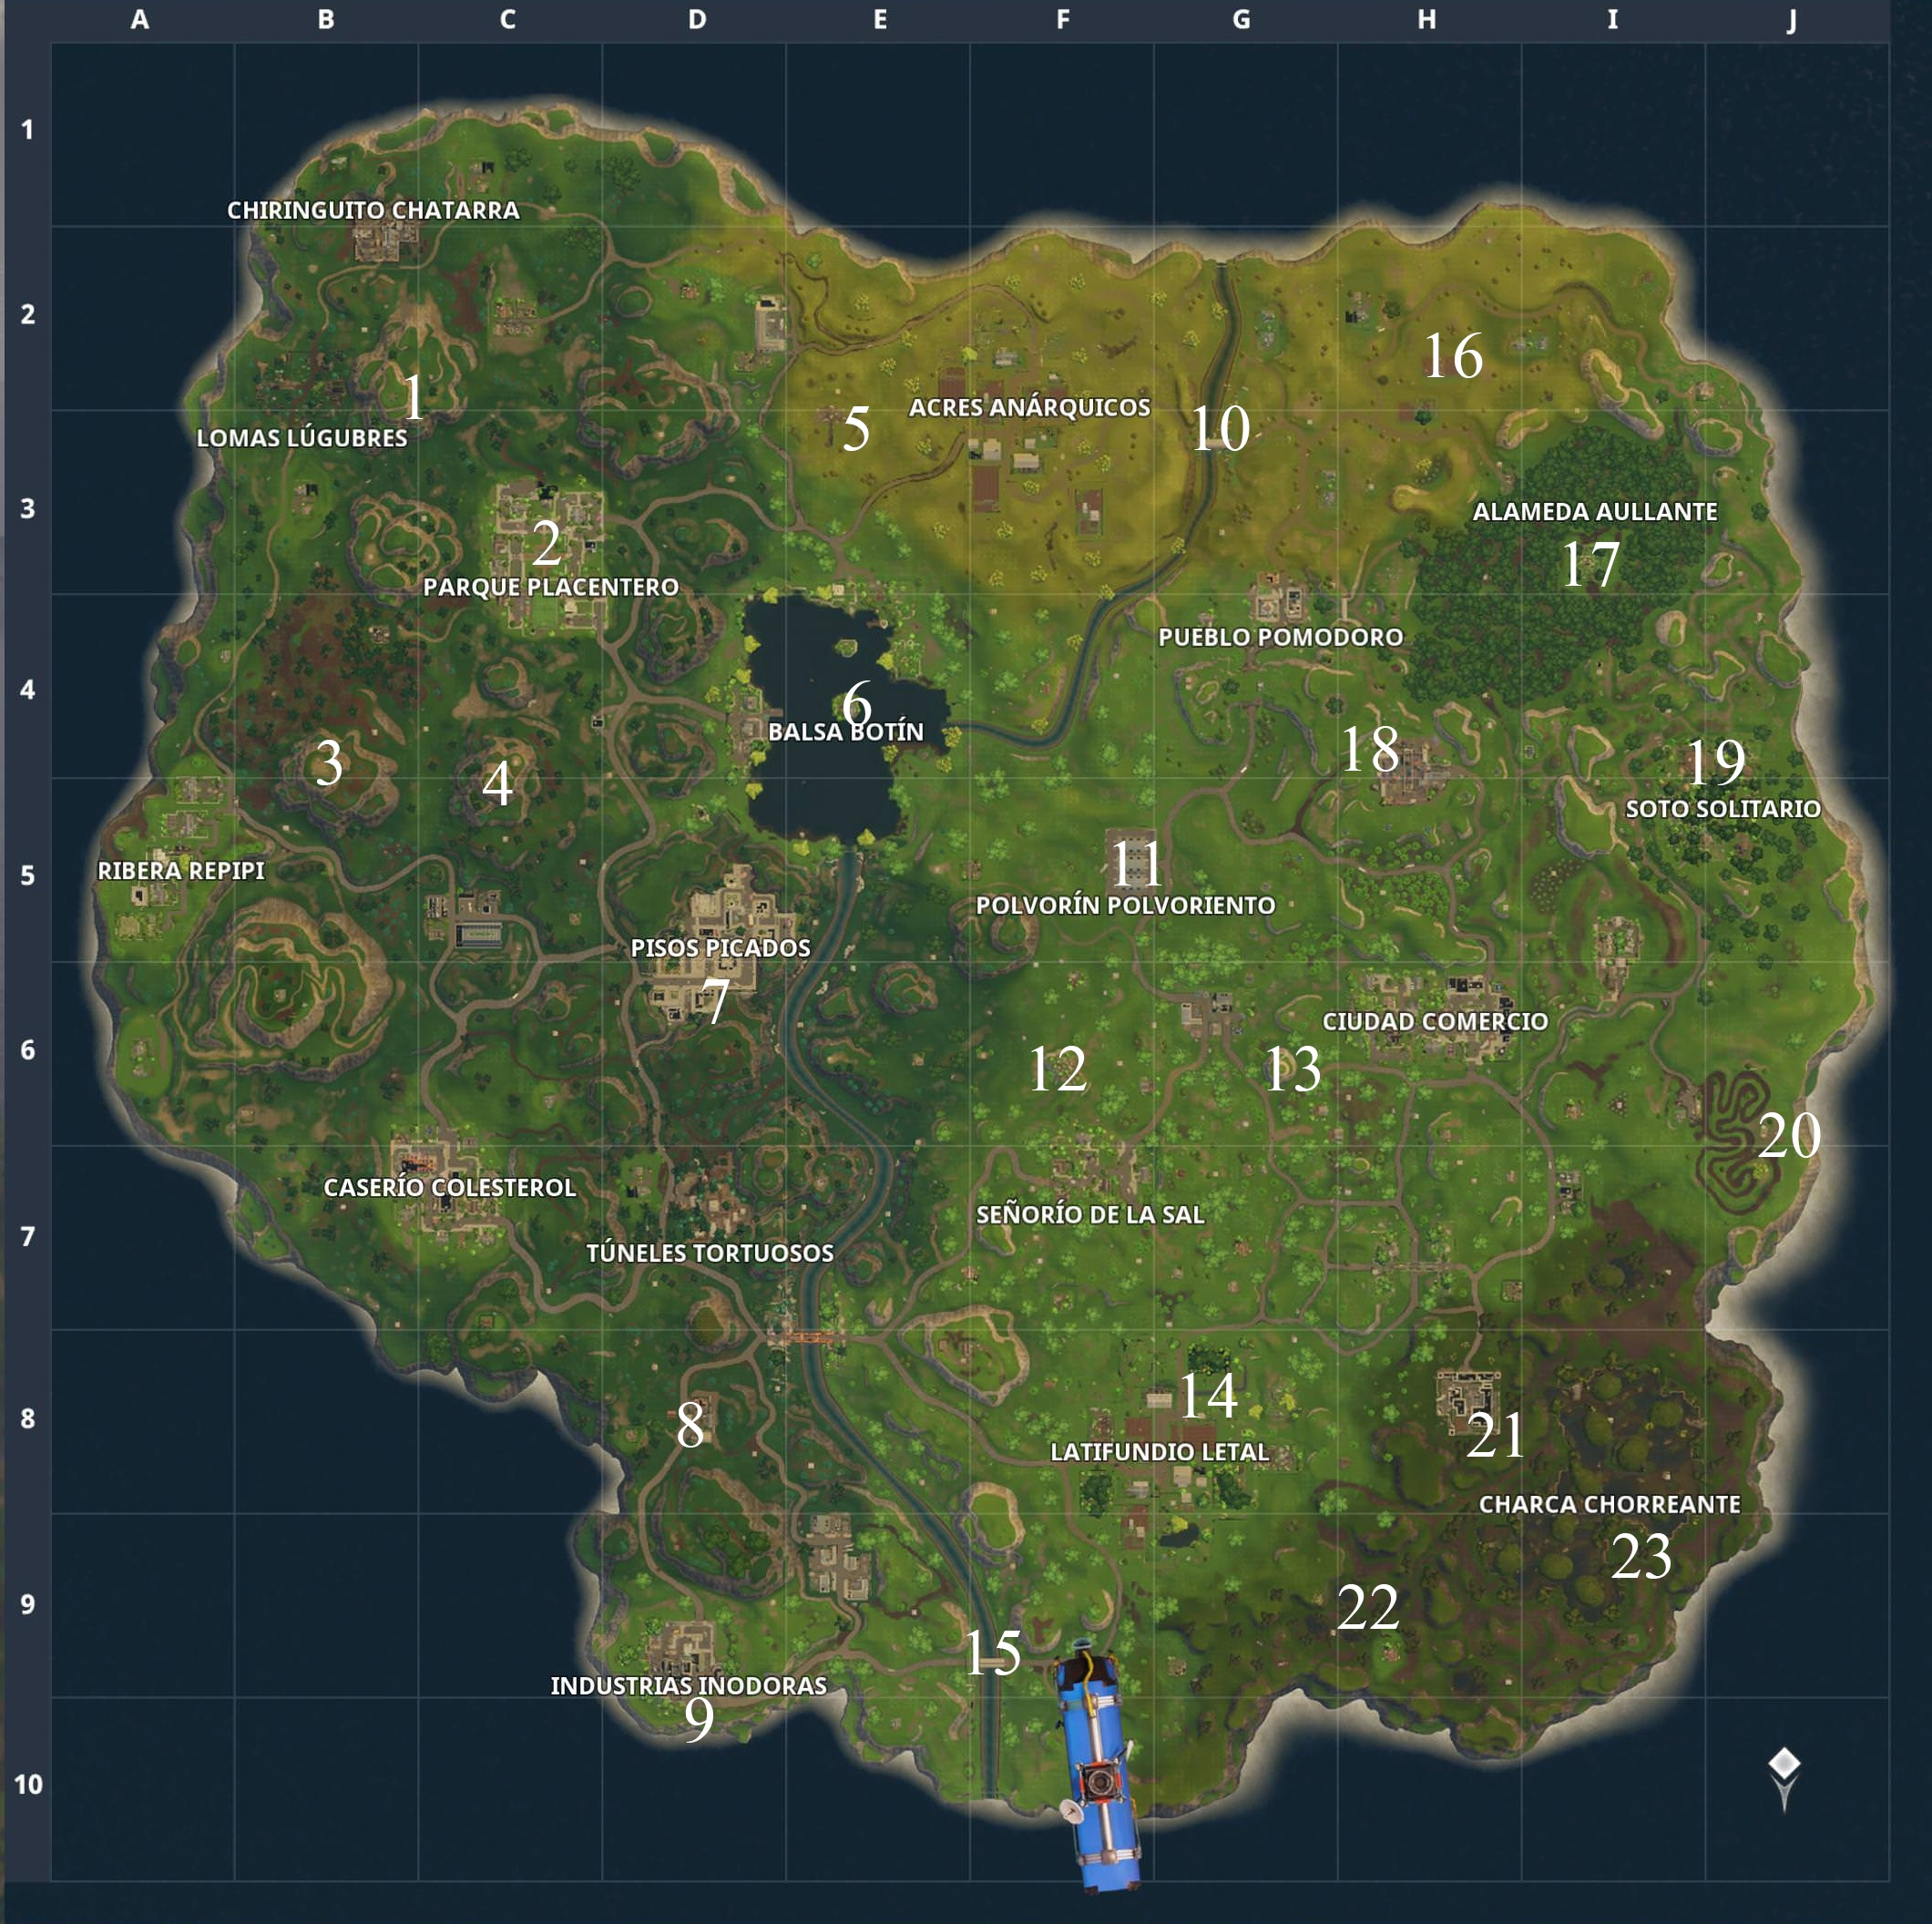 Mapa Fortnite Temporada 4.Guia Del Tercer Desafio Semanal De Fortnite Battle Royale